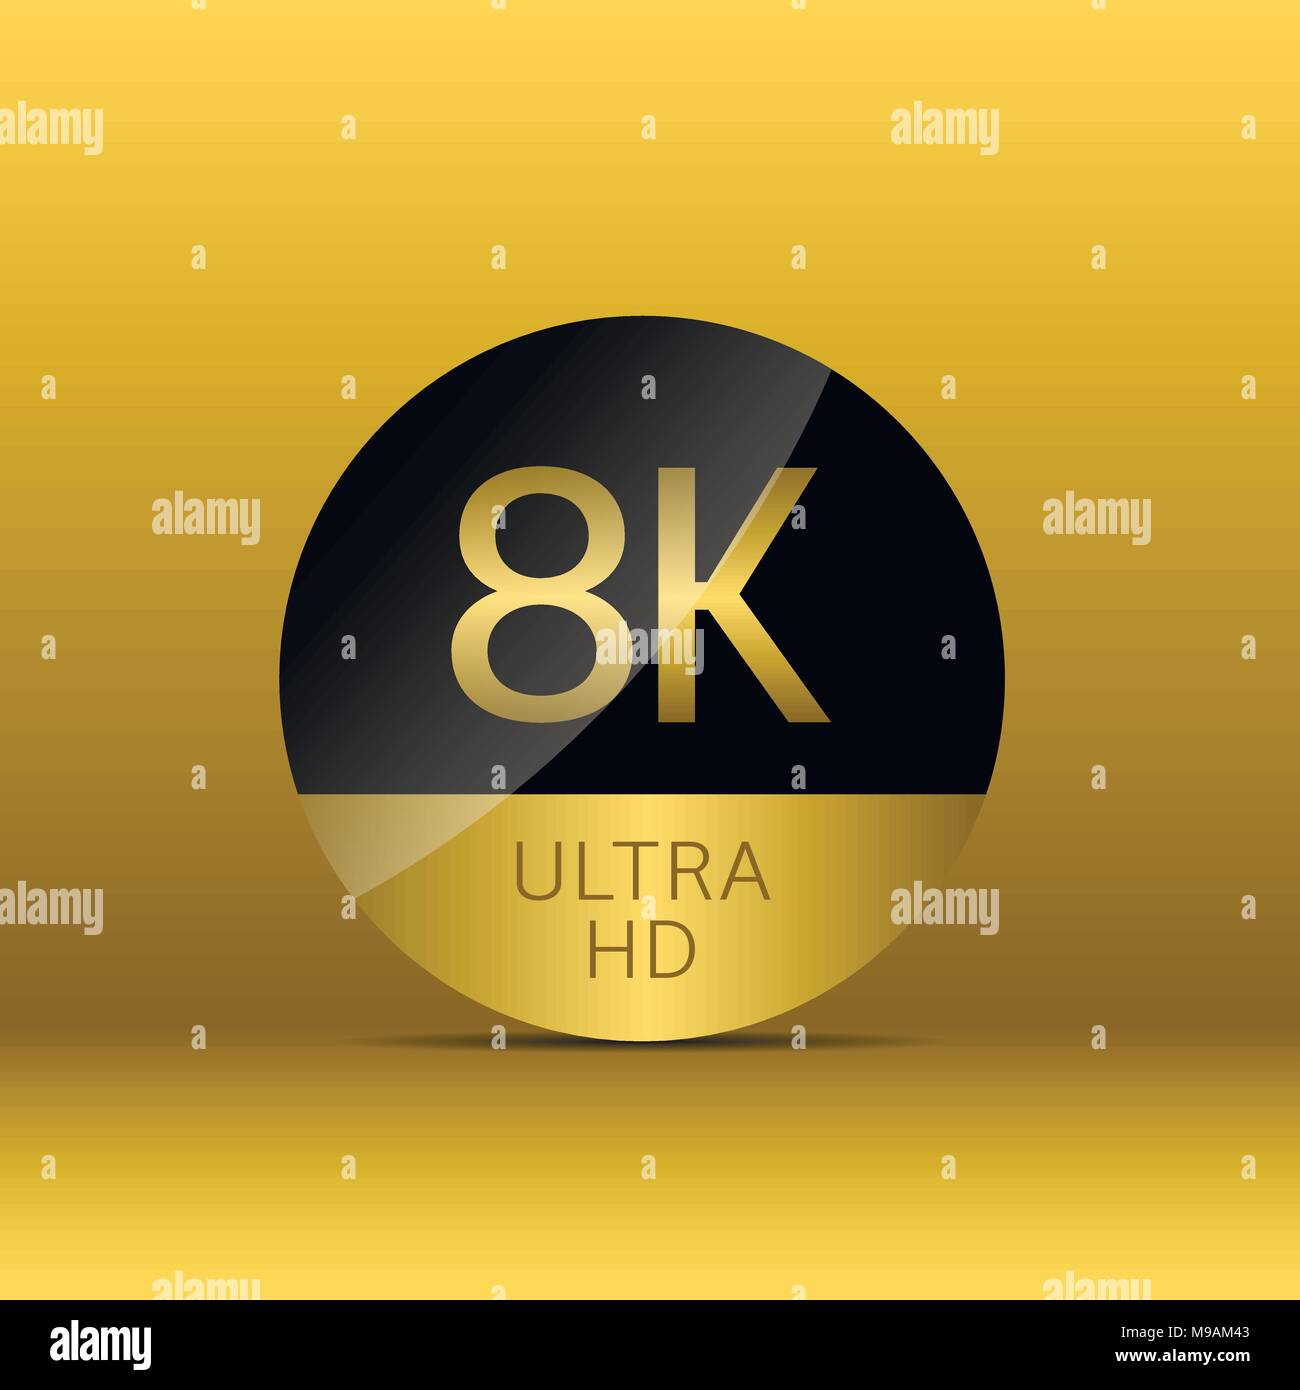 8K Ultra HD icon - Stock Image